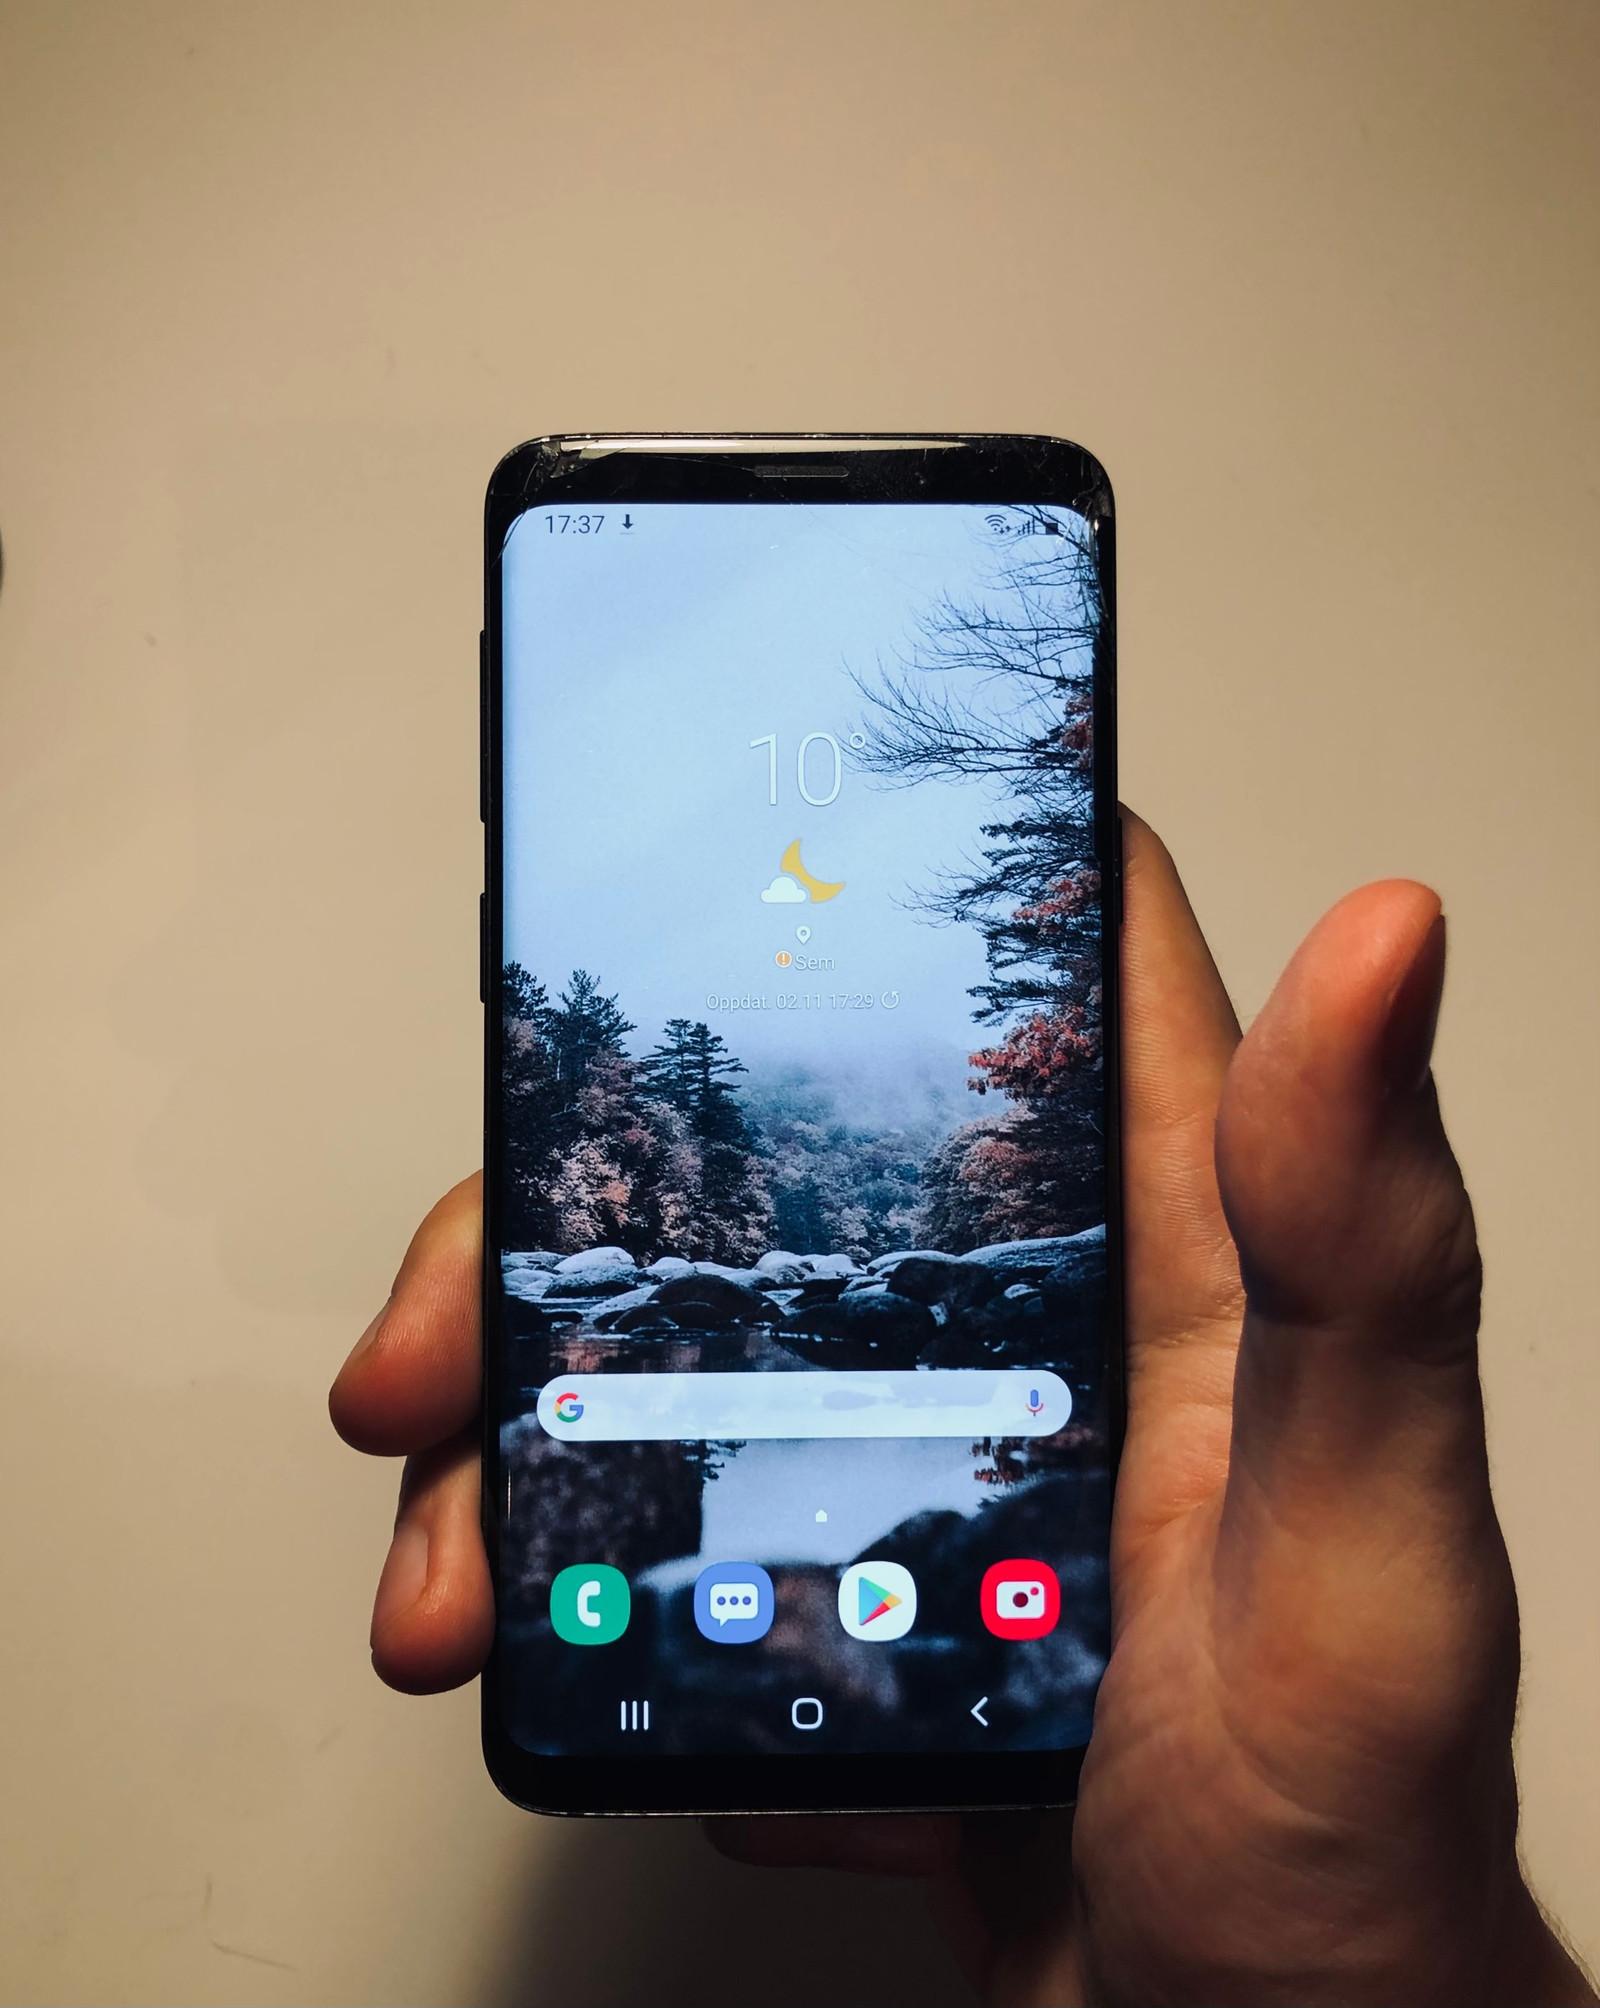 Samsung S9 Selges billig! Oppussing prosjekt! 64GB trådløs